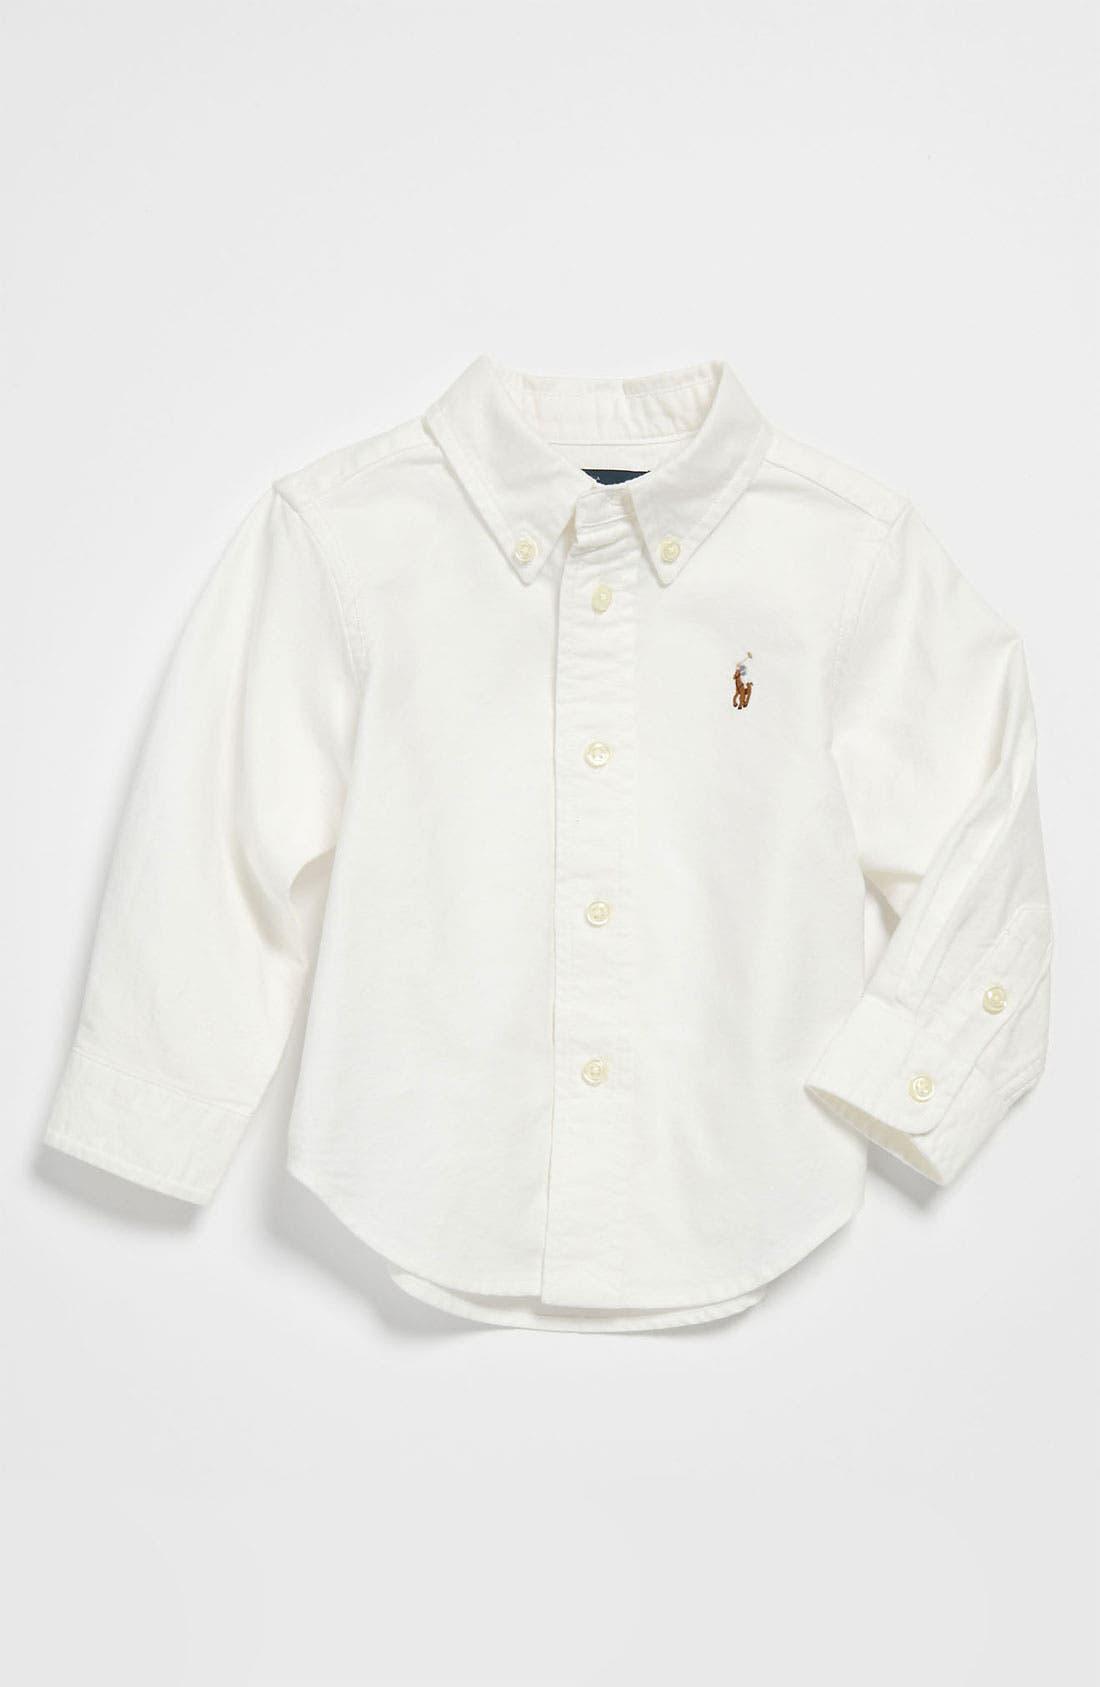 Alternate Image 1 Selected - Ralph Lauren Woven Shirt (Baby)